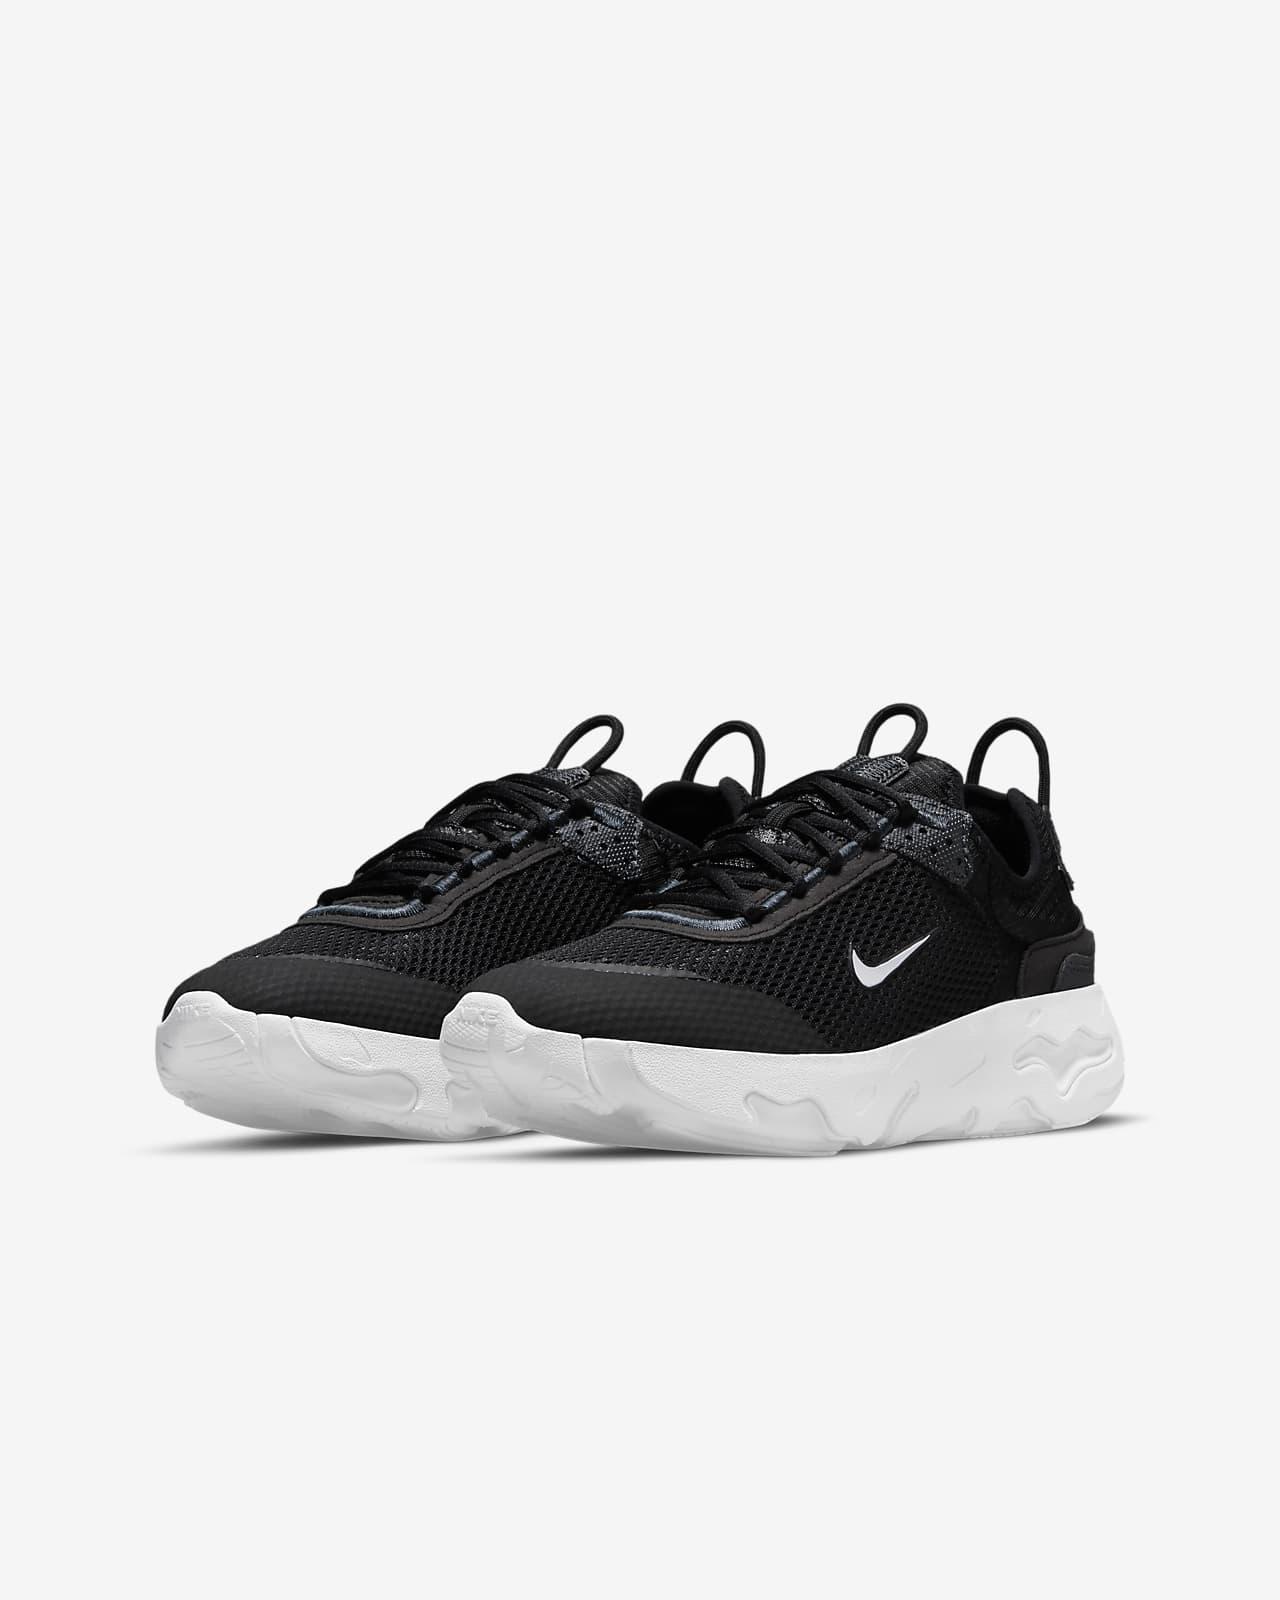 Nike React Live Older Kids' Shoe. Nike SA